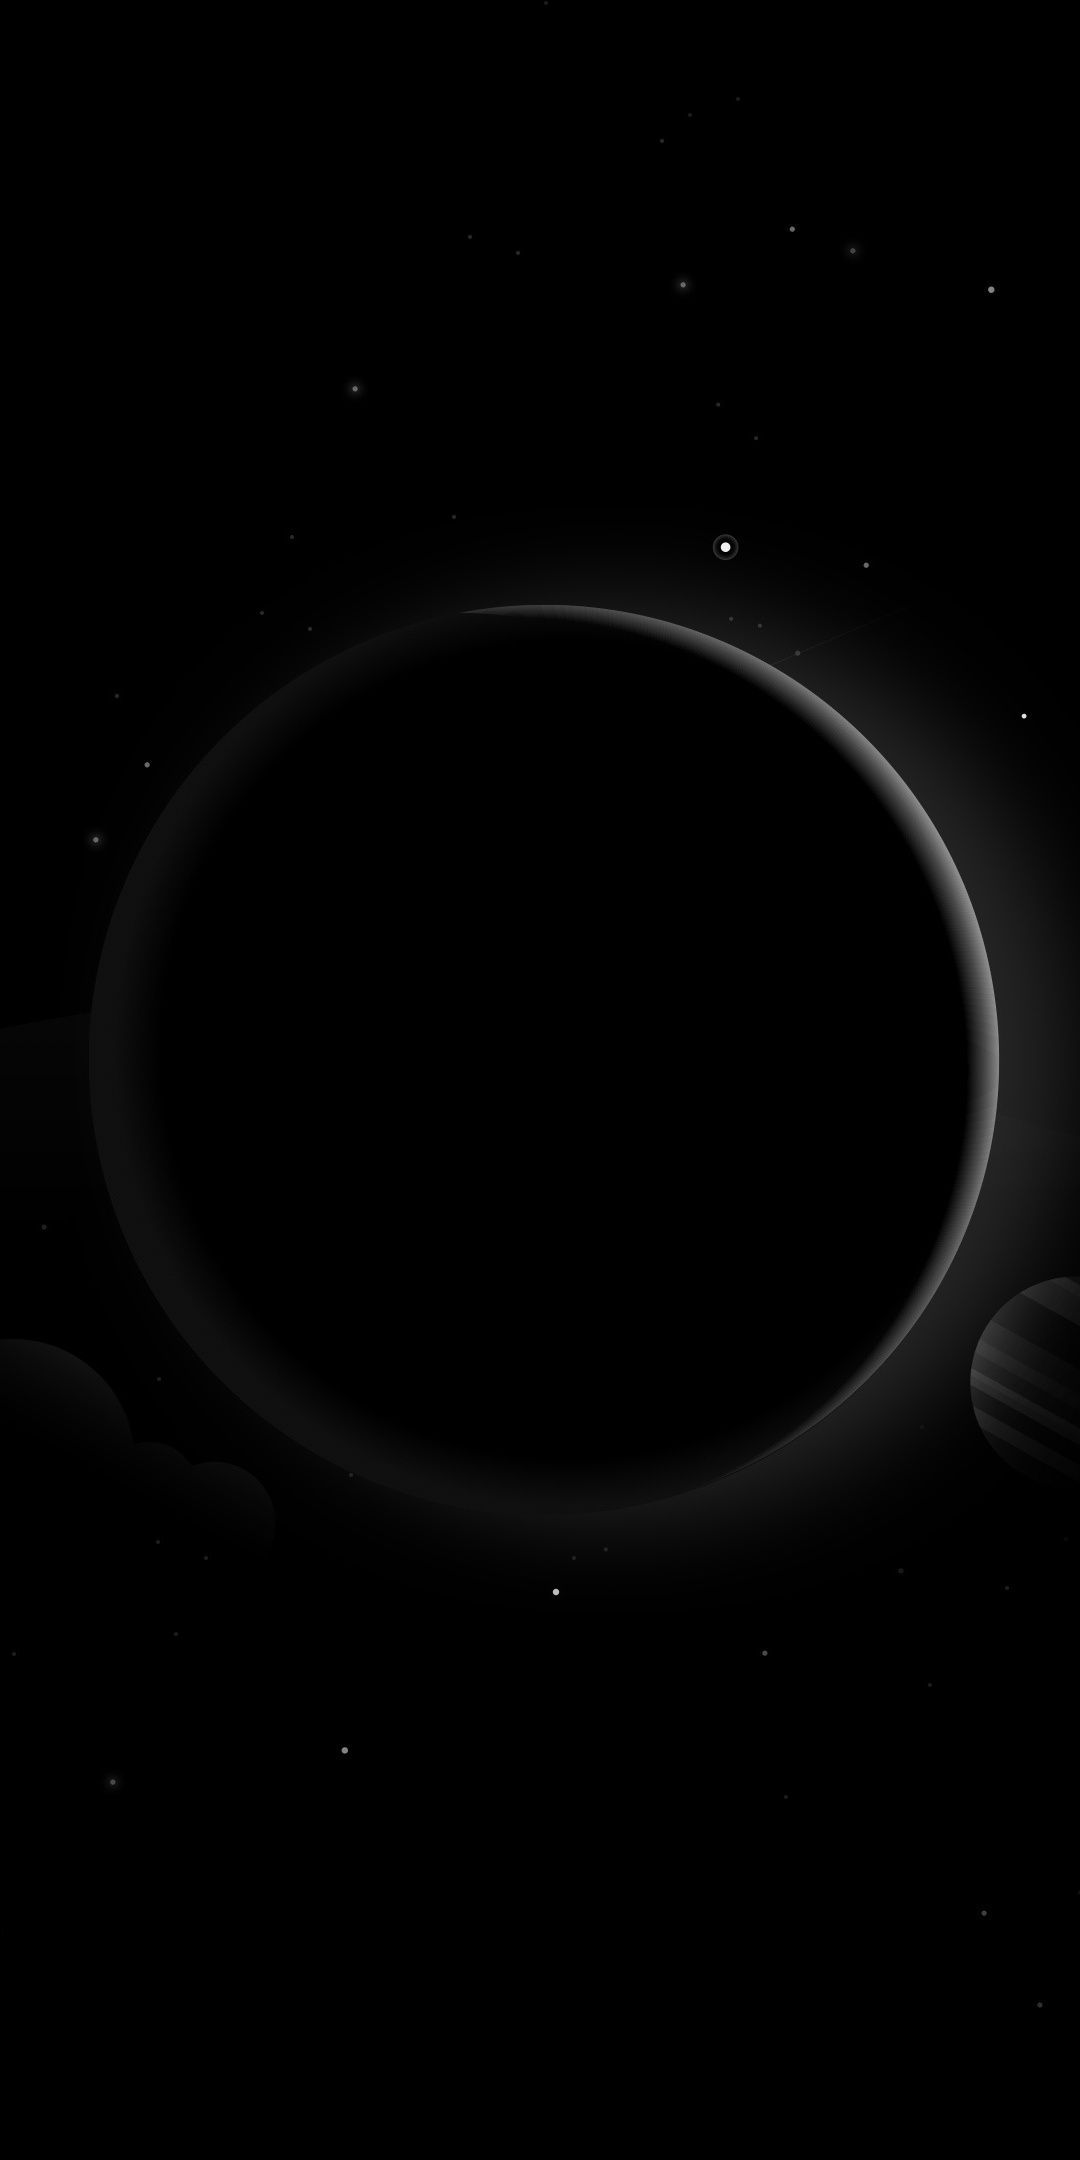 Dark Planet Wallpapers Top Free Dark Planet Backgrounds Wallpaperaccess